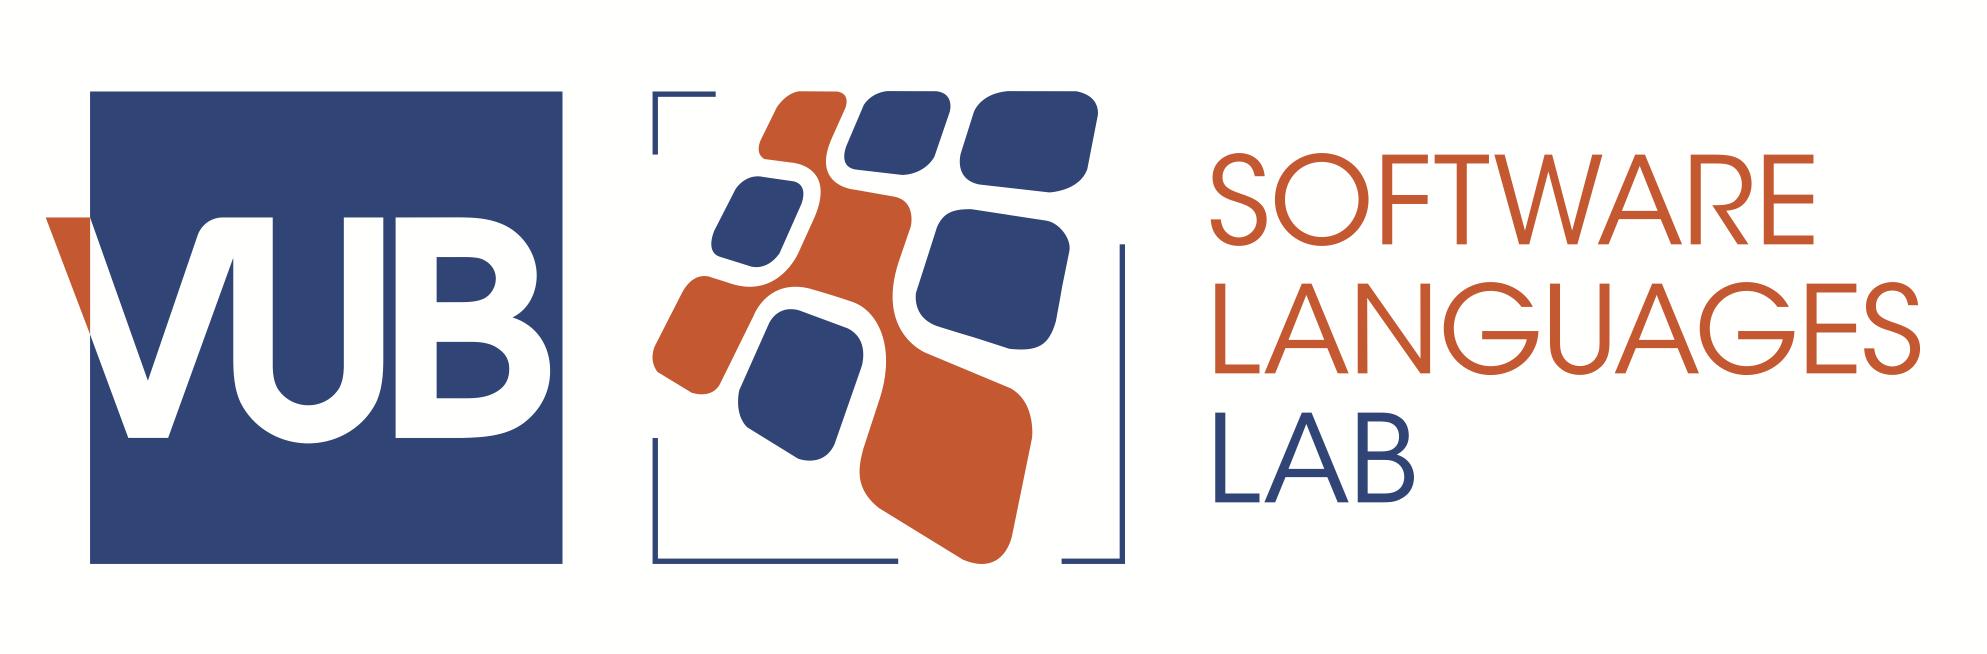 Software Languages Lab